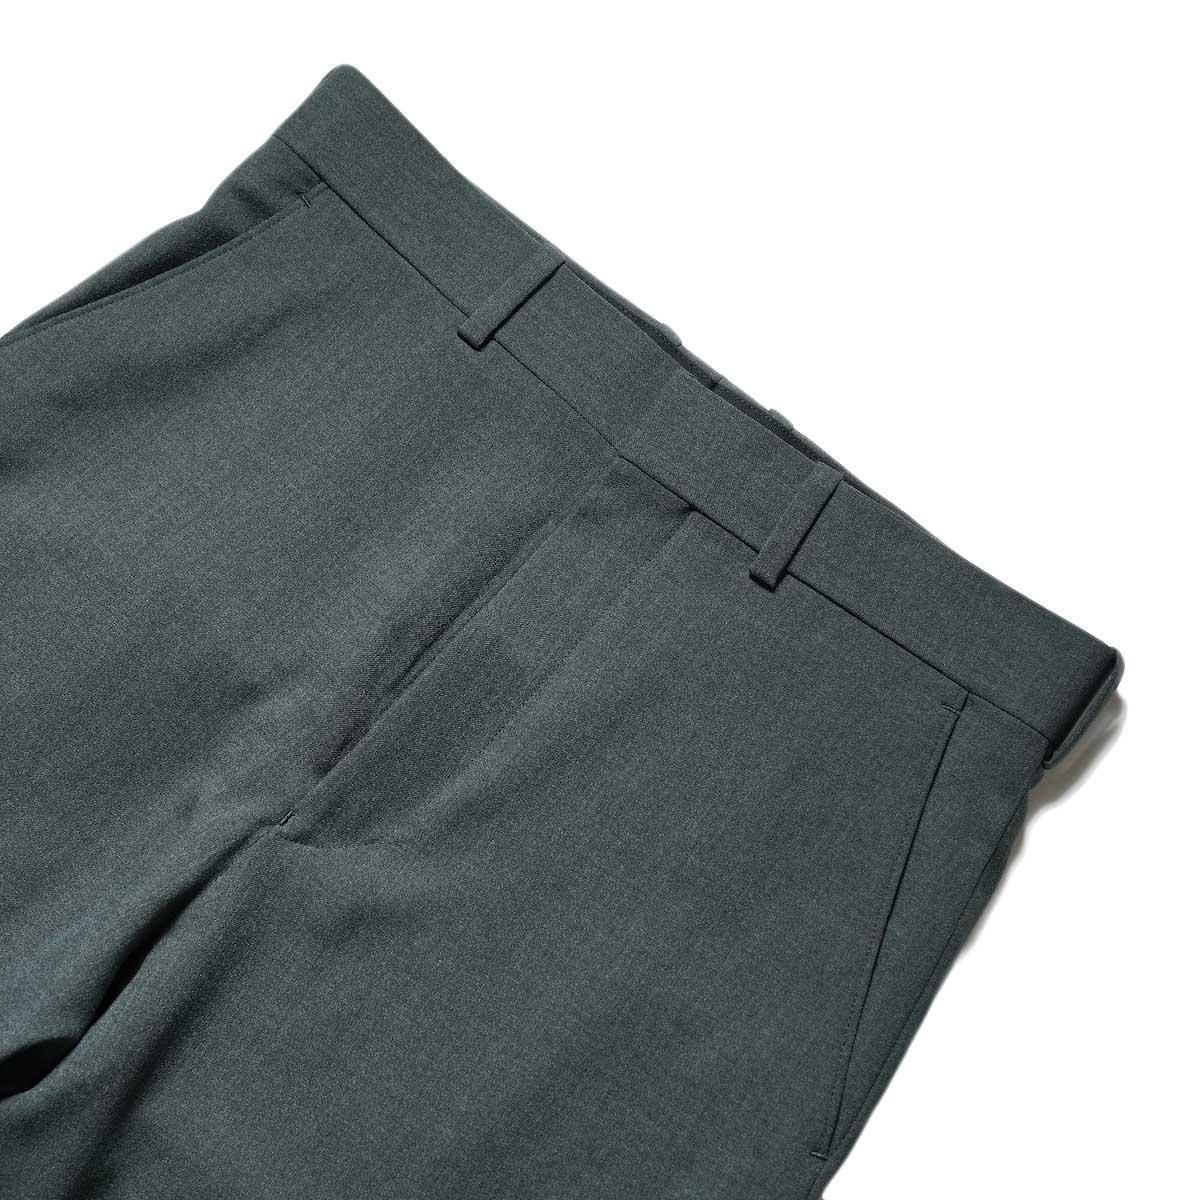 N.HOOLYWOOD / 2212-PT21-008 Flair Slacks (Charcoal)ウエスト